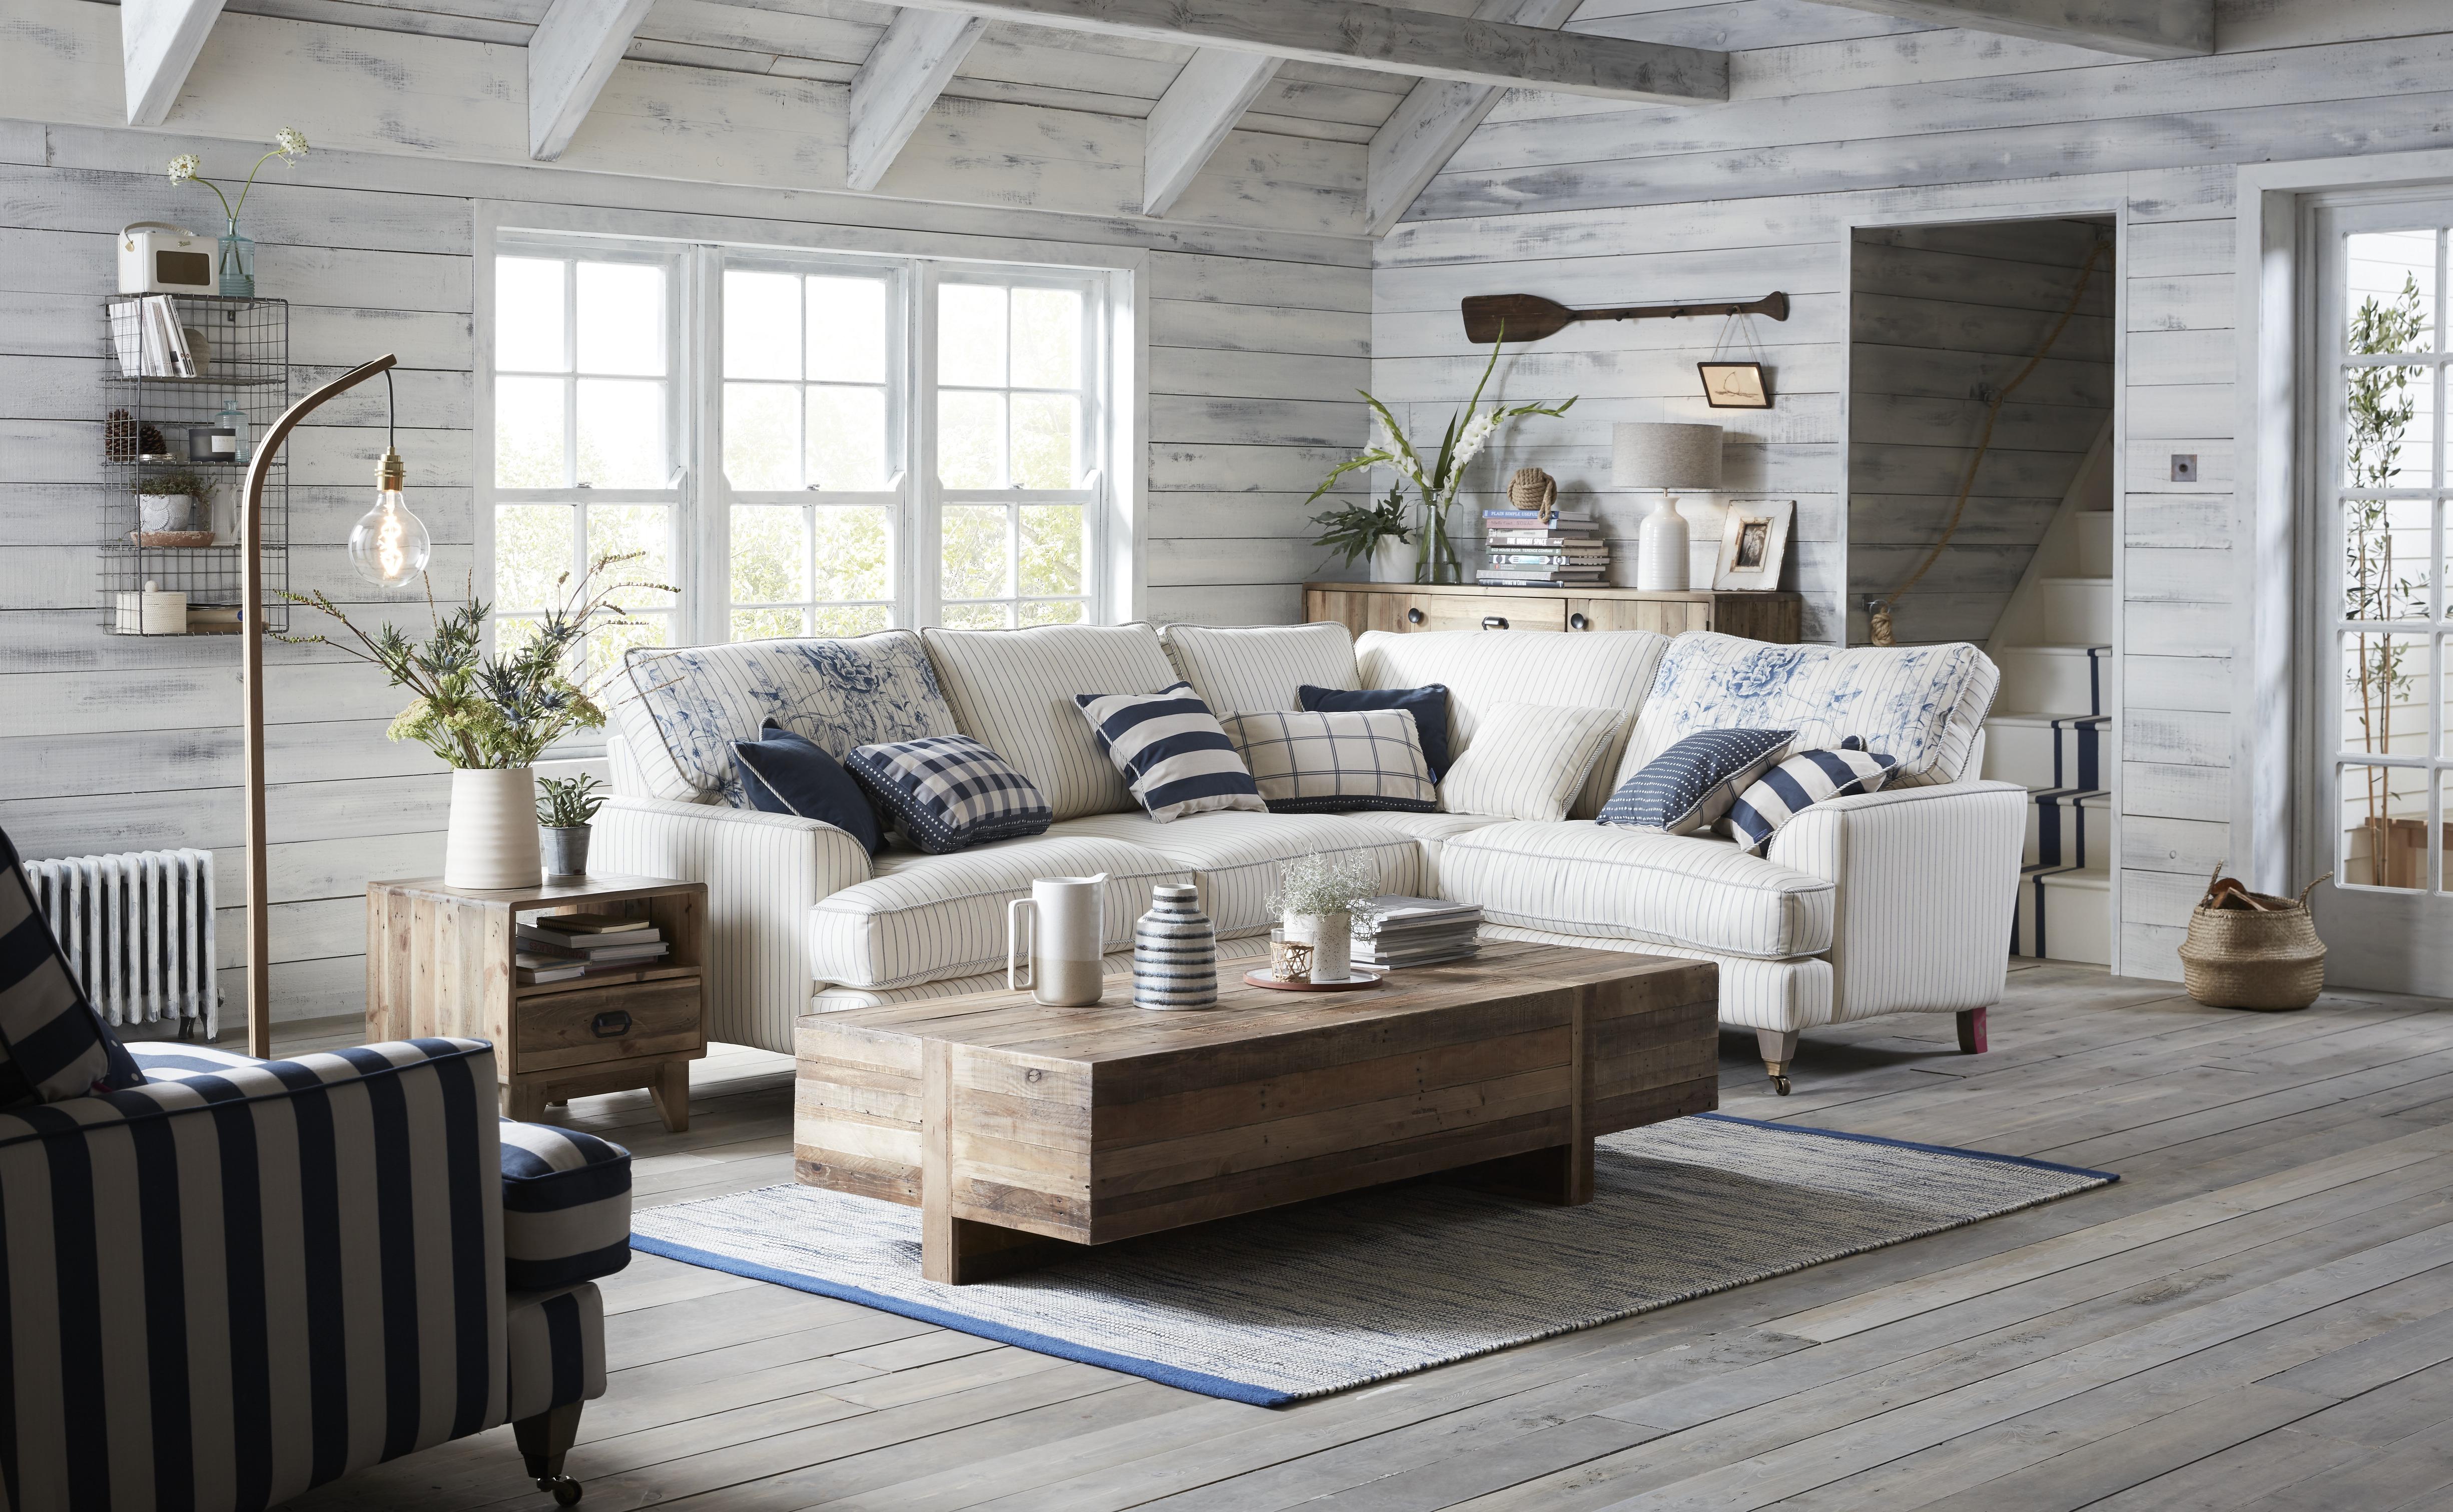 Beach House Interiors 17 Ways To Get The Coastal Look